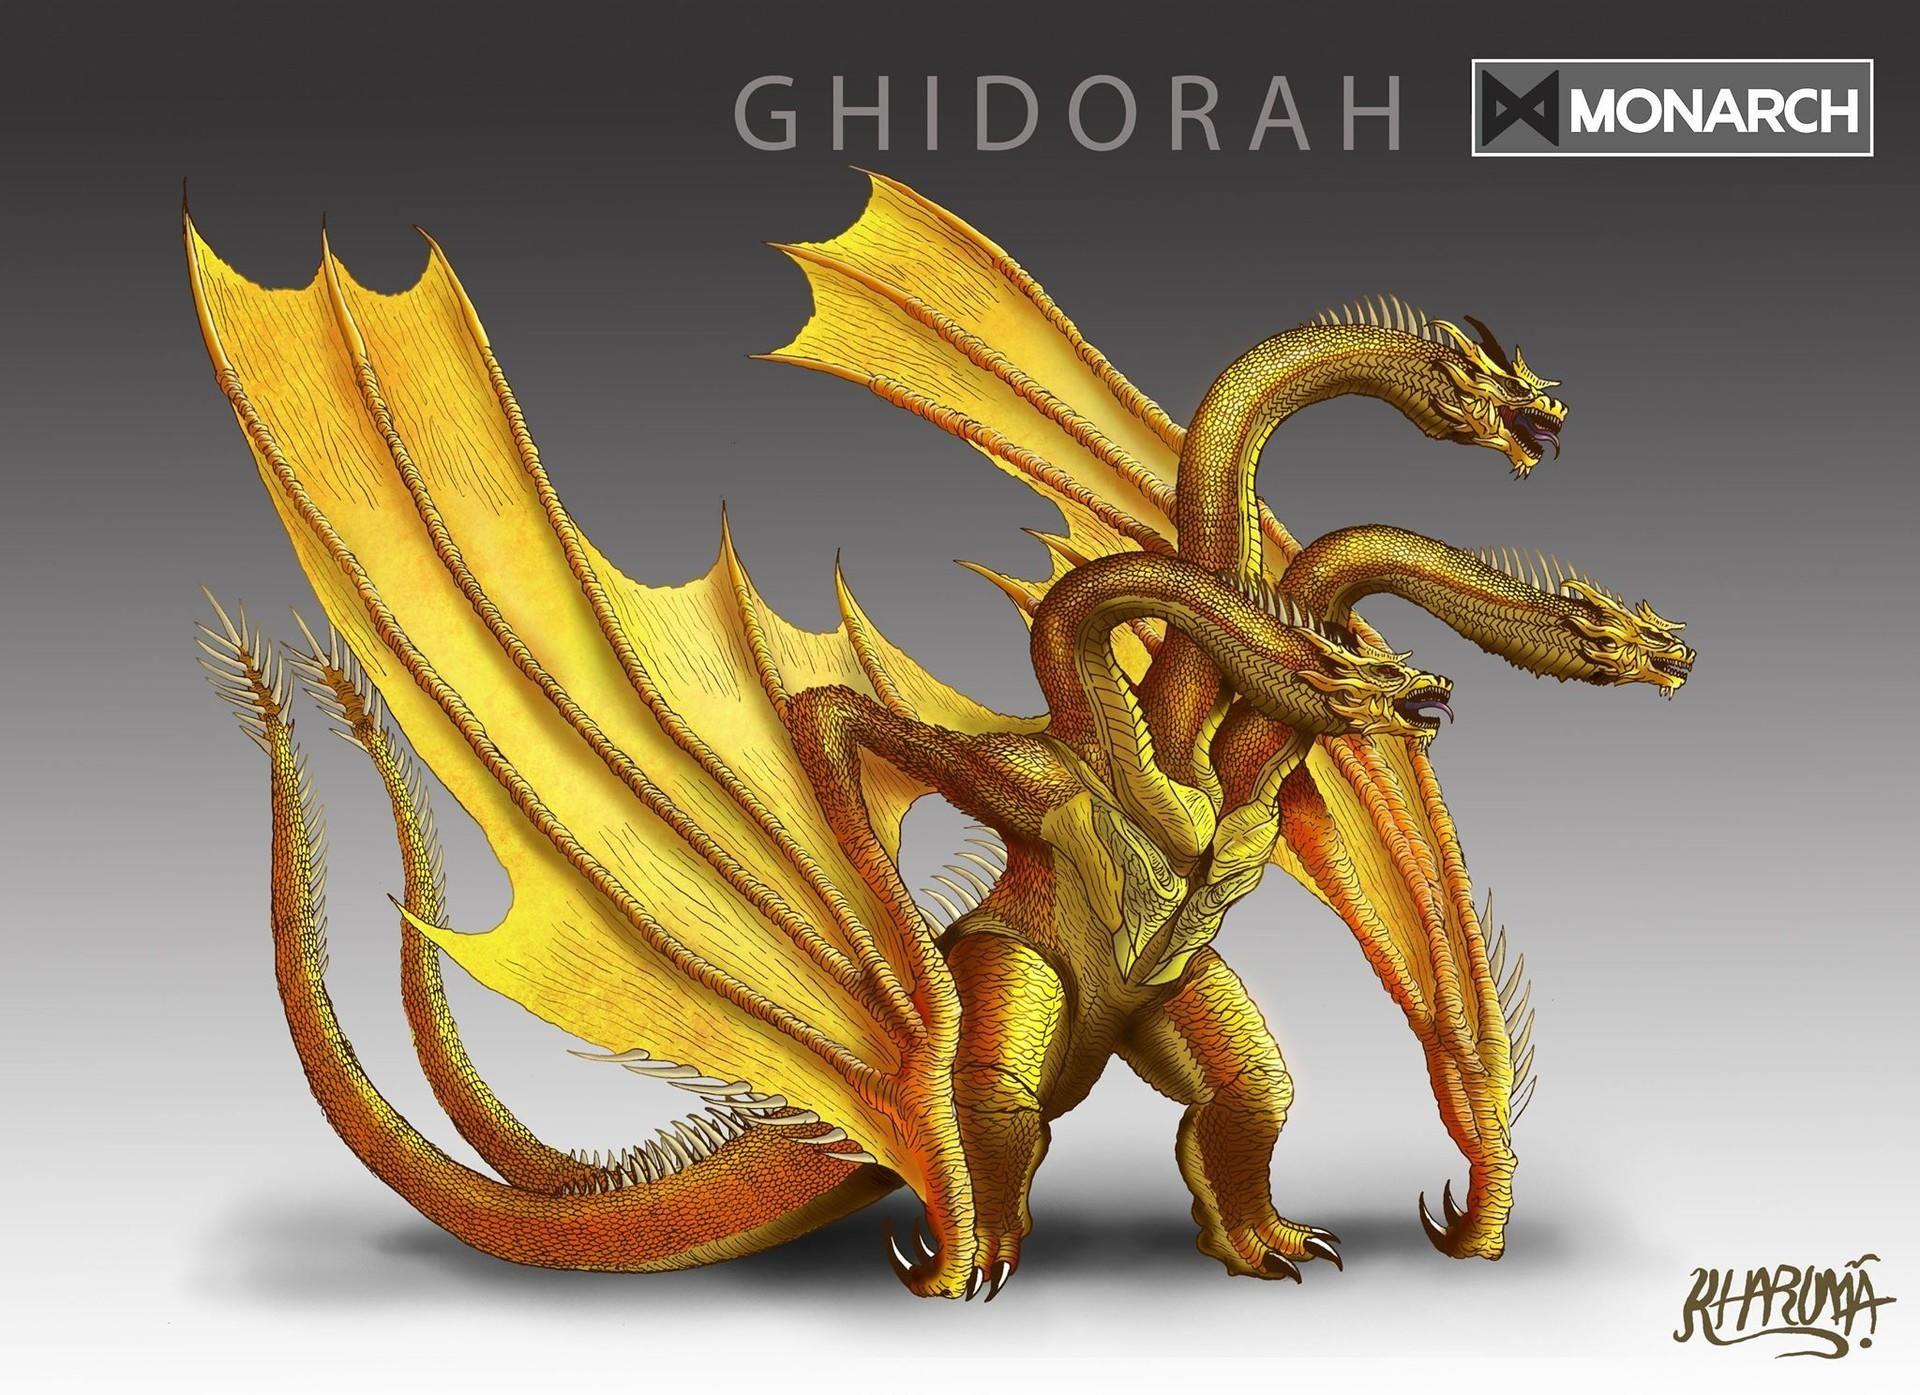 King Ghidorah fan art   Godzilla   Godzilla, Godzilla vs ...